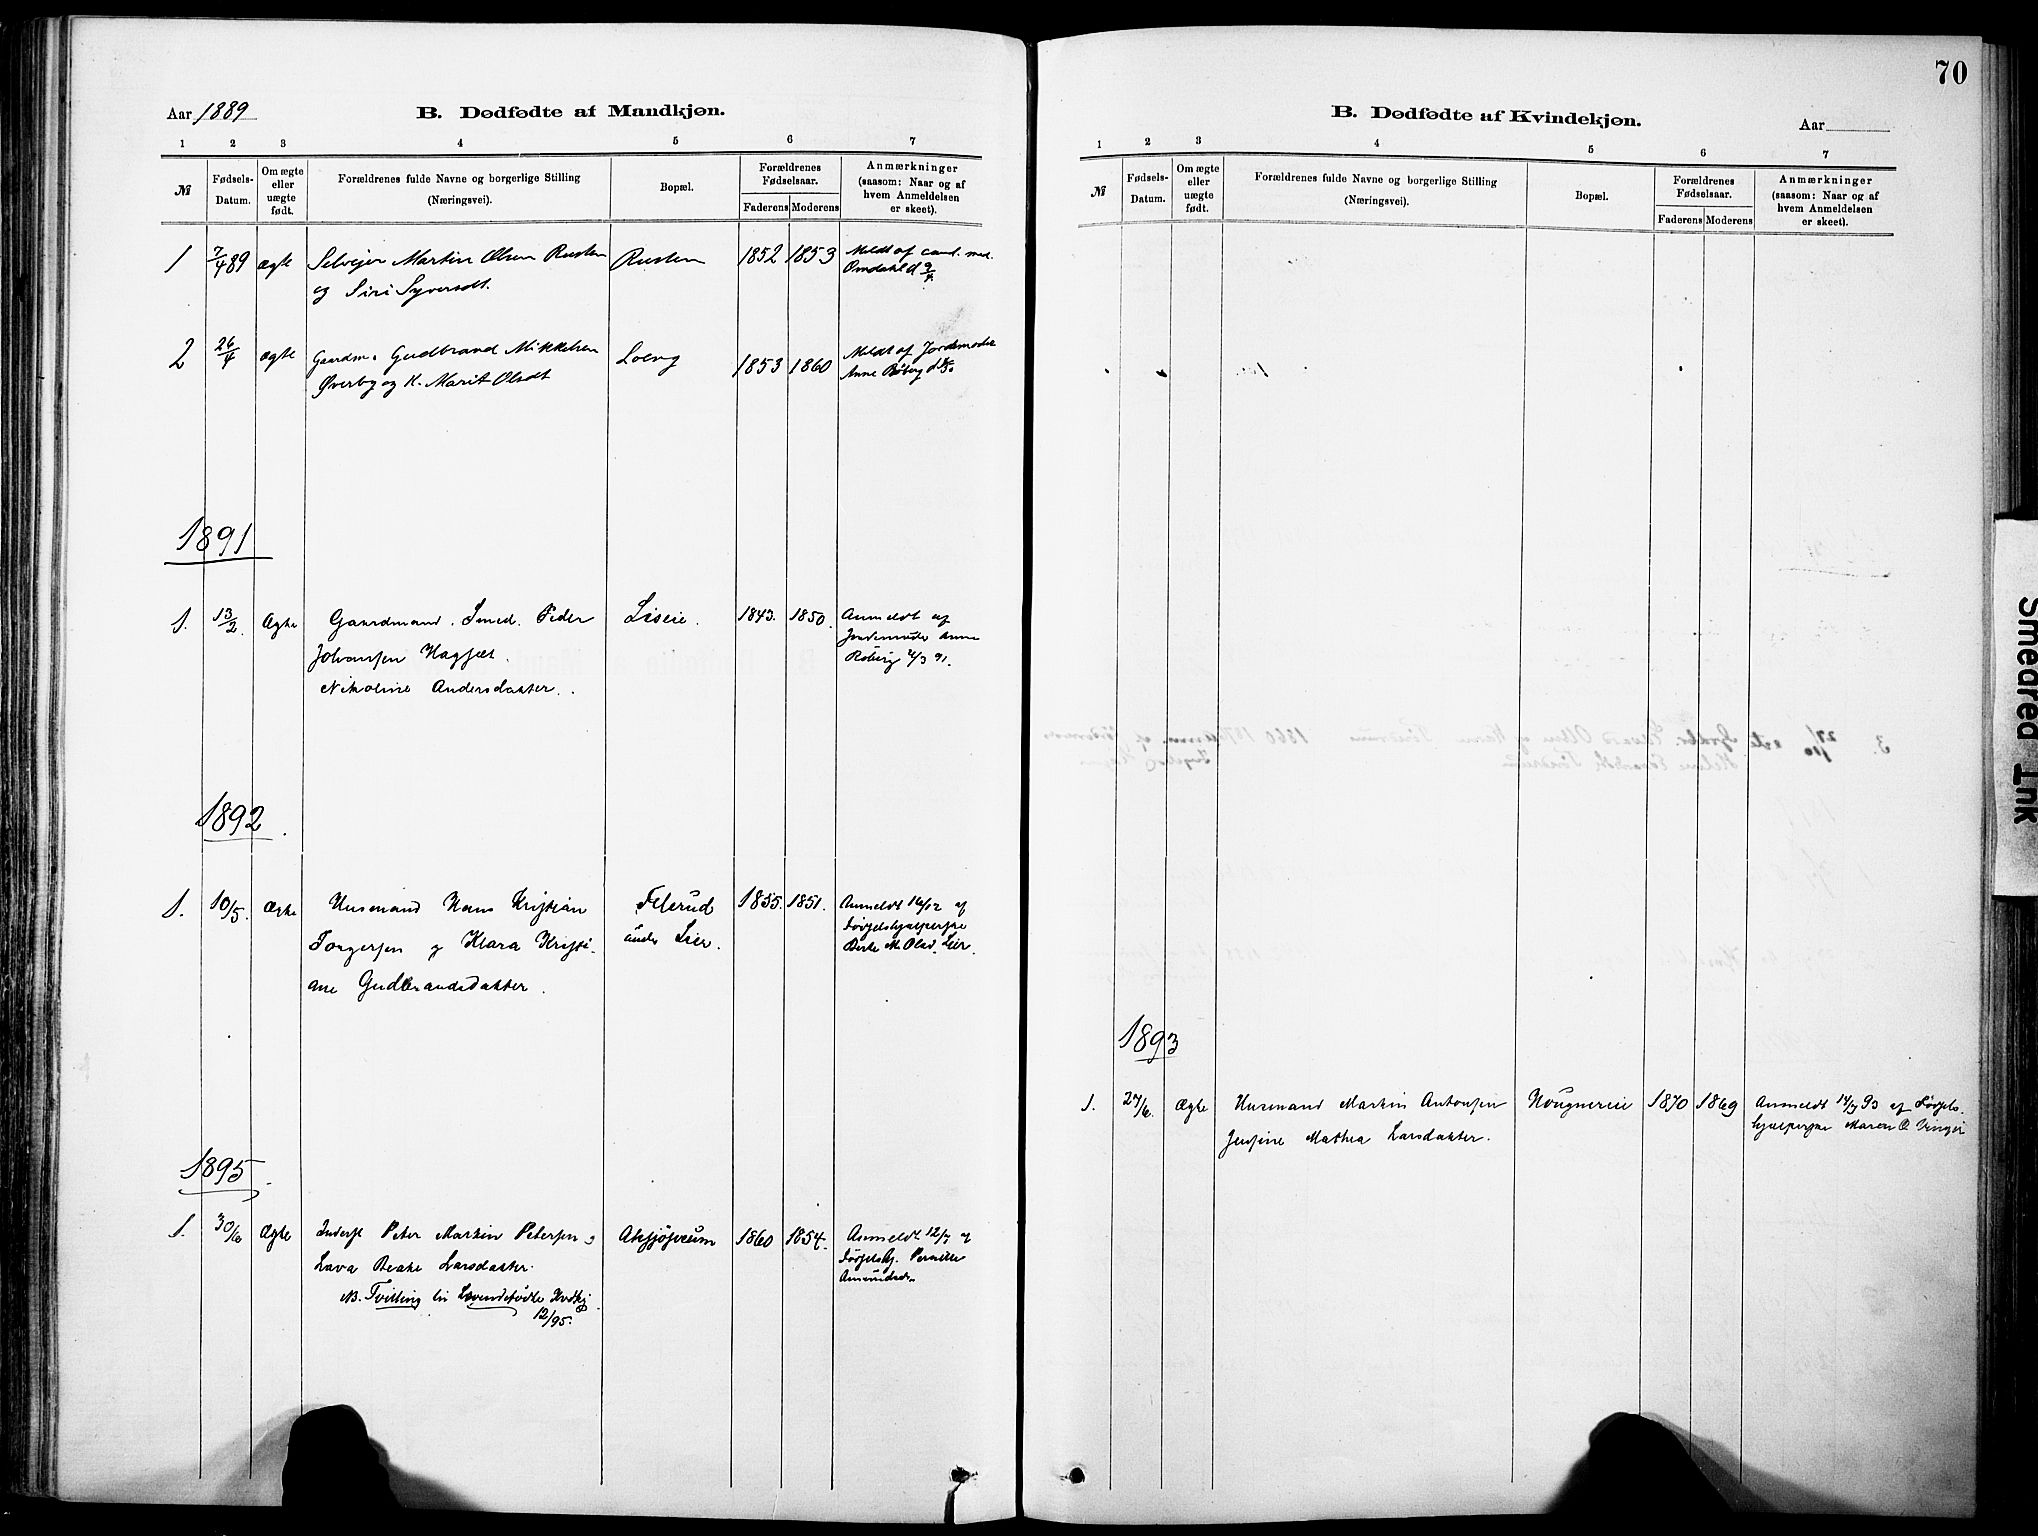 SAH, Nordre Land prestekontor, Ministerialbok nr. 5, 1882-1903, s. 70